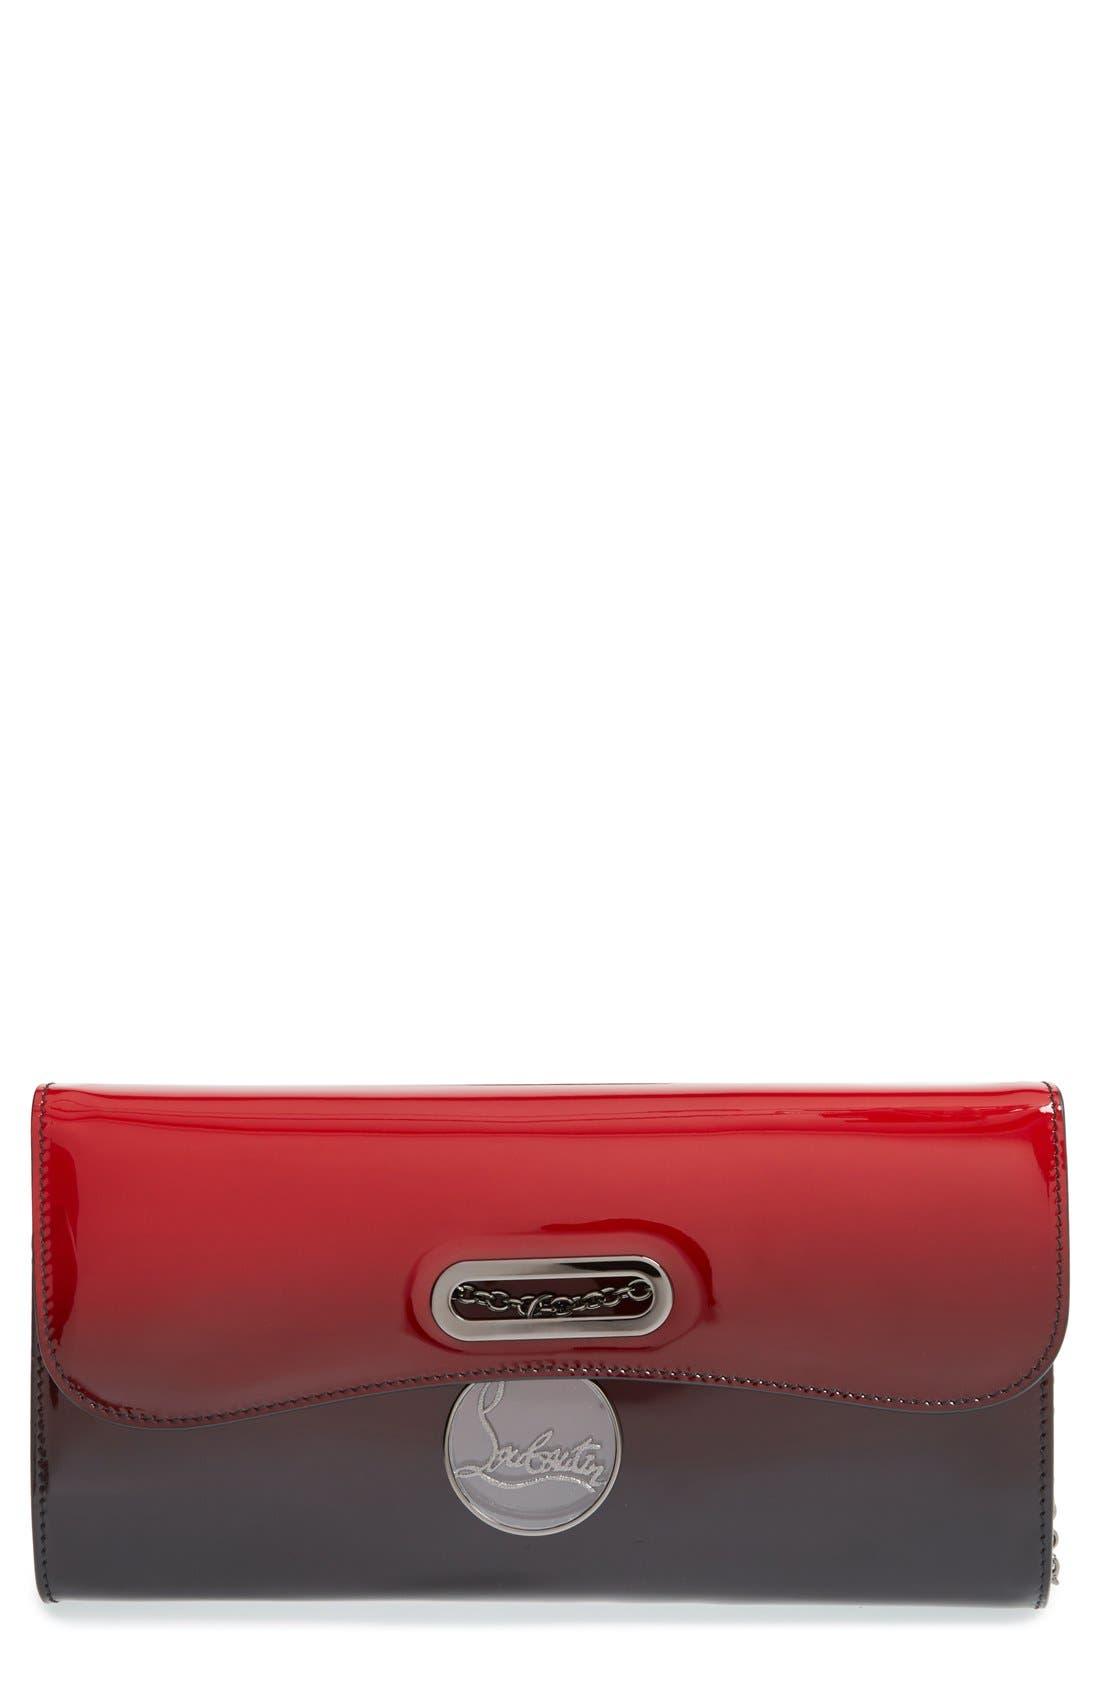 Main Image - Christian Louboutin 'Riviera' Dégradé Patent Leather Clutch